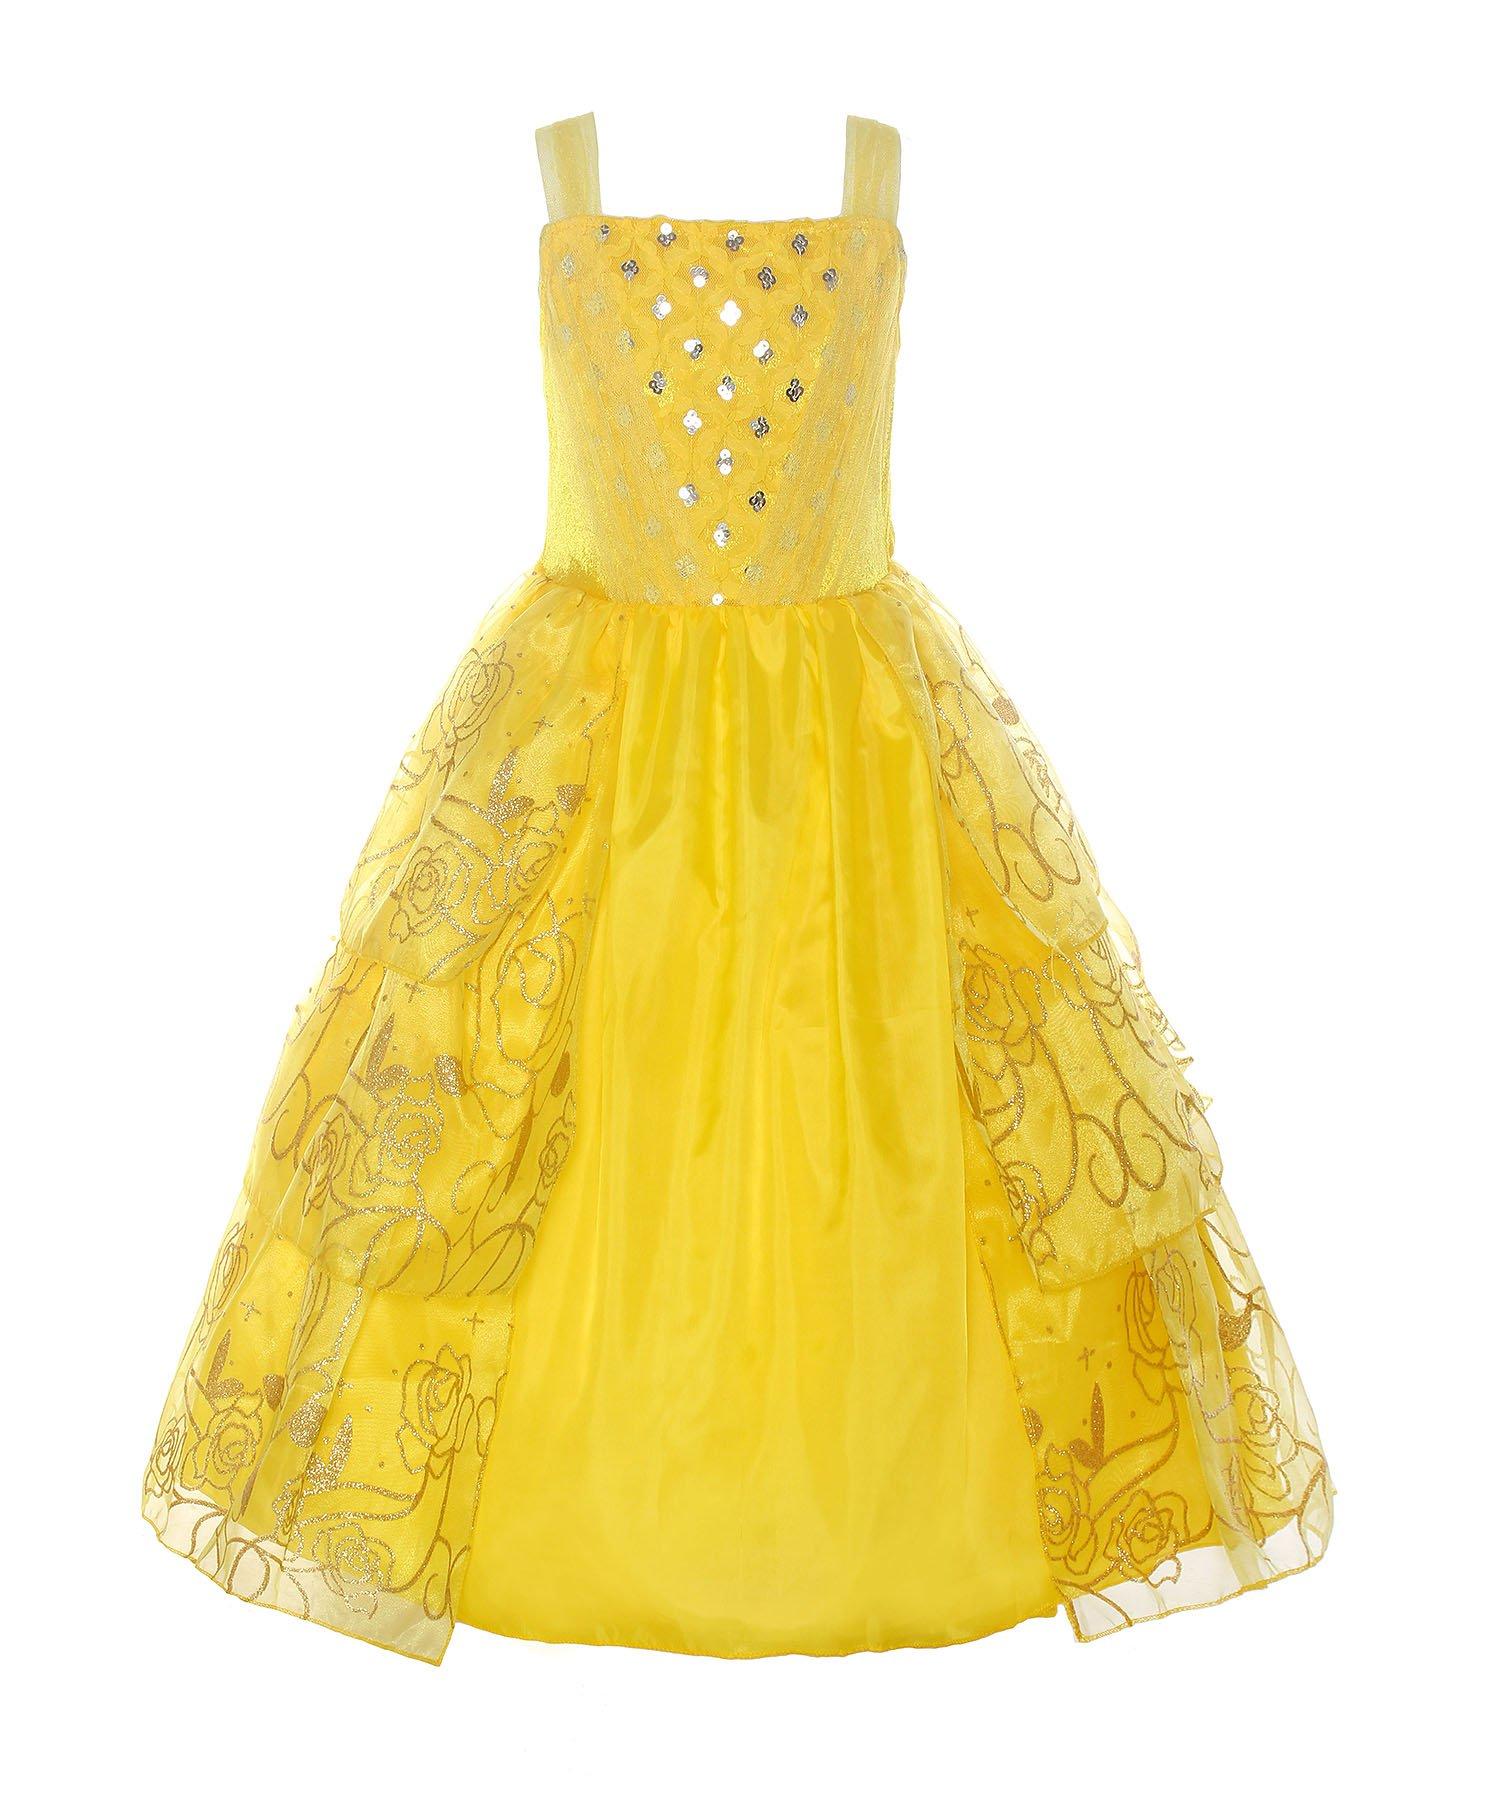 ReliBeauty Girls Sleeveless Sequin Princess Belle Costume Dress up, Yellow, 6-6X